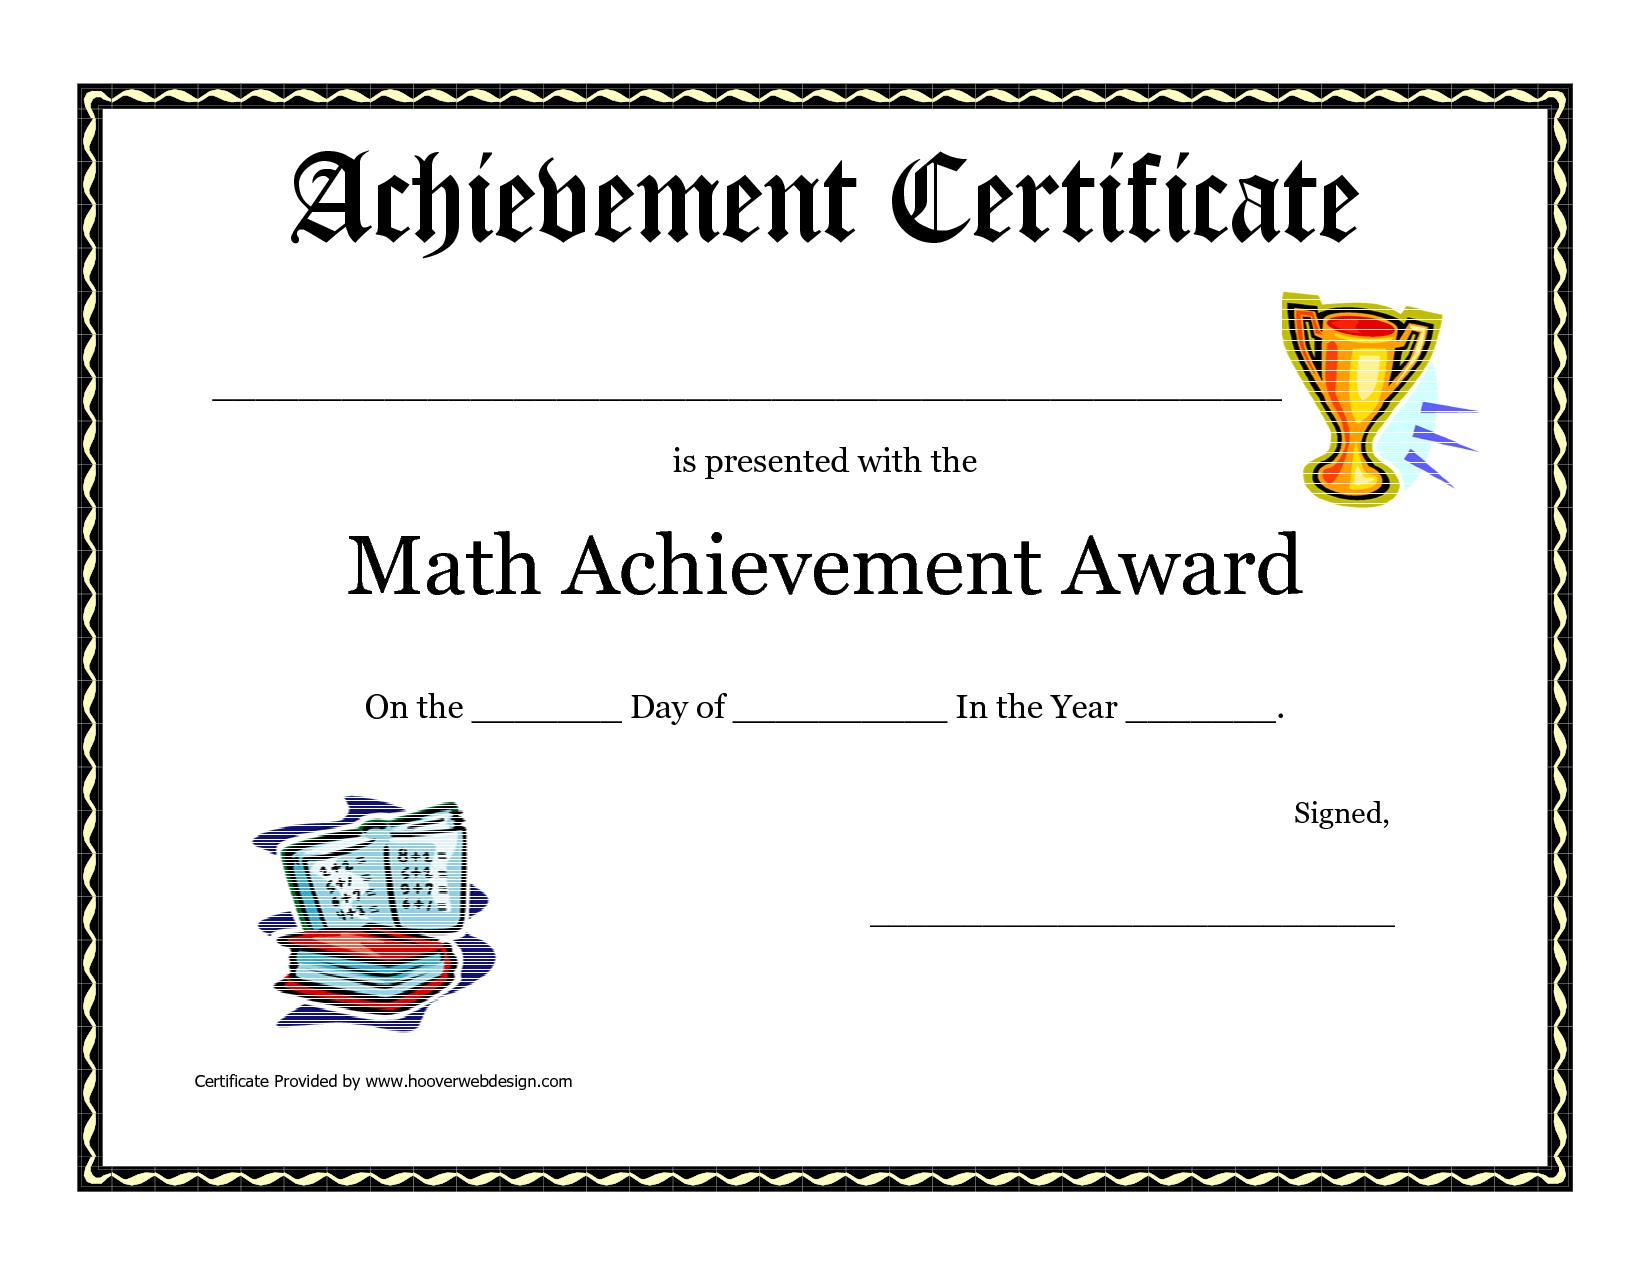 Math Achievement Award Printable Certificate